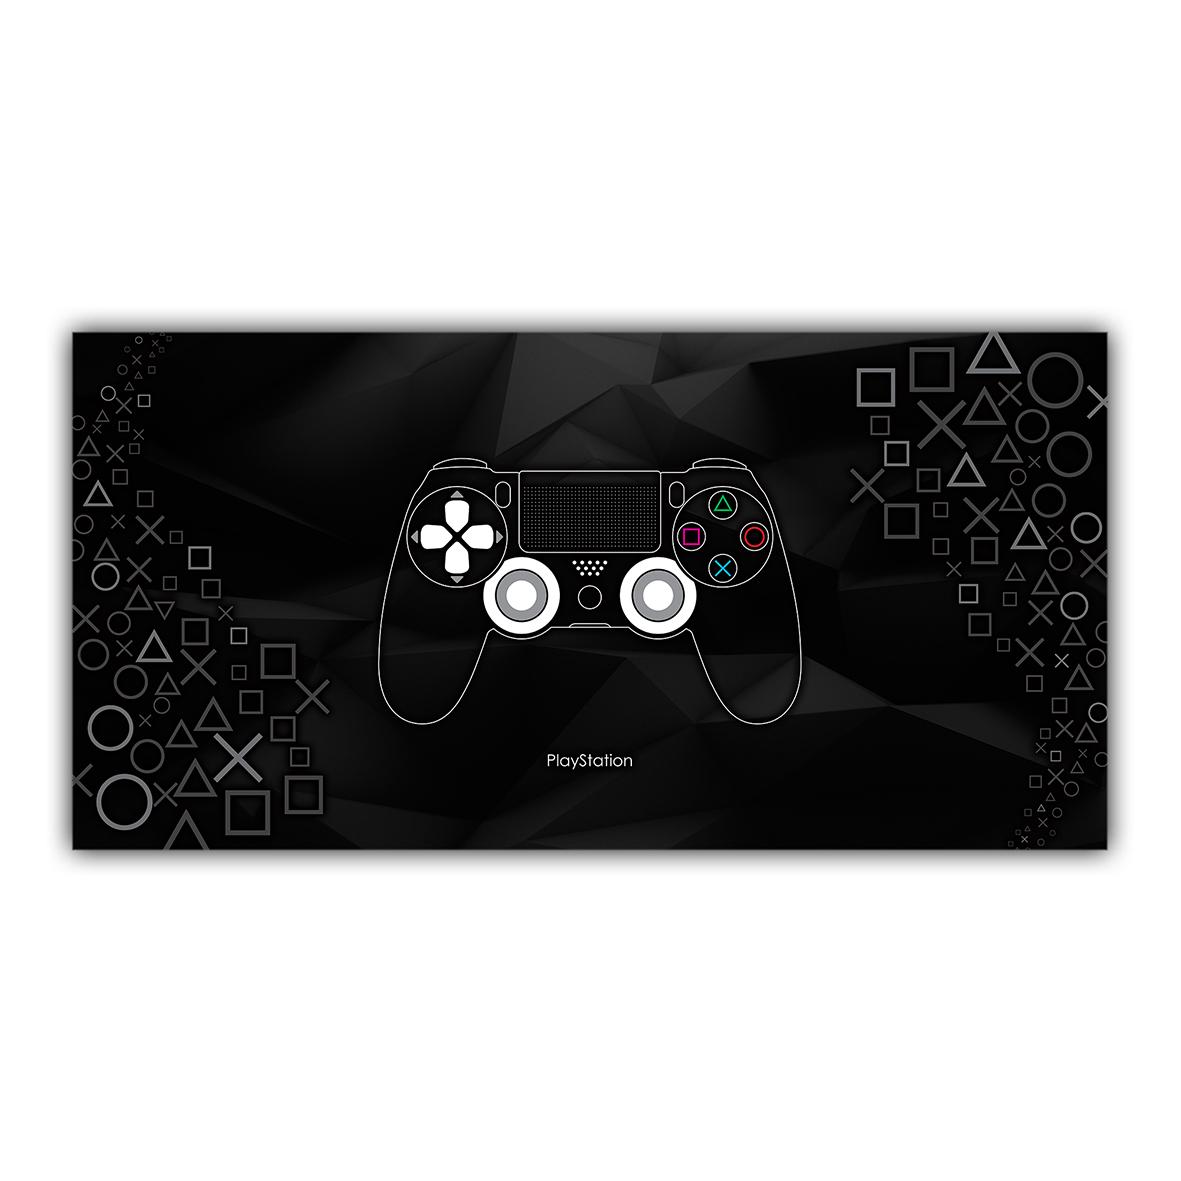 Playstation Sony Jeux Vidéo Manette Console